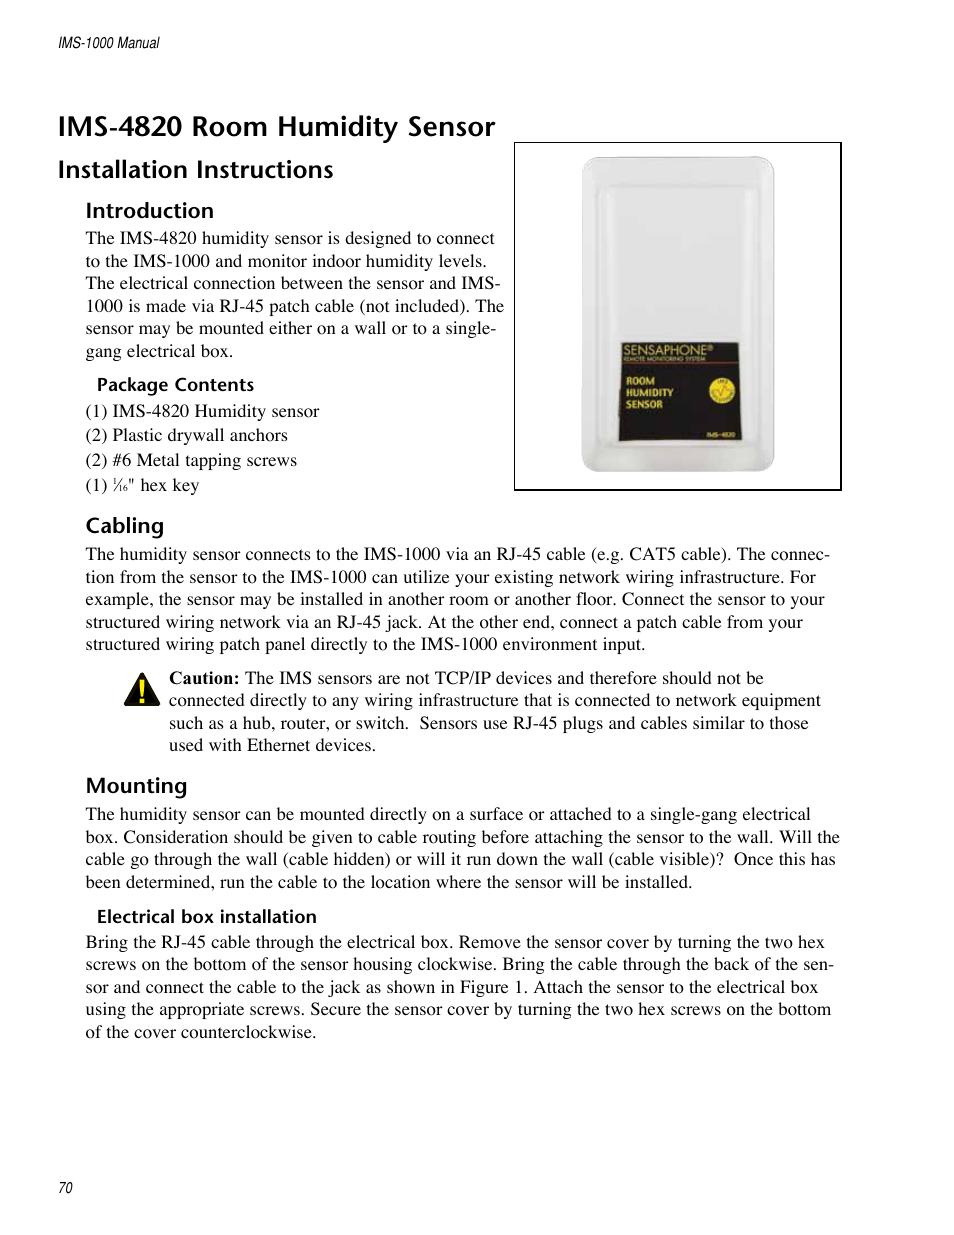 Ims-4820 room humidity sensor, Installation instructions | Sensaphone  IMS-1000 Users manual User Manual | Page 70 / 114